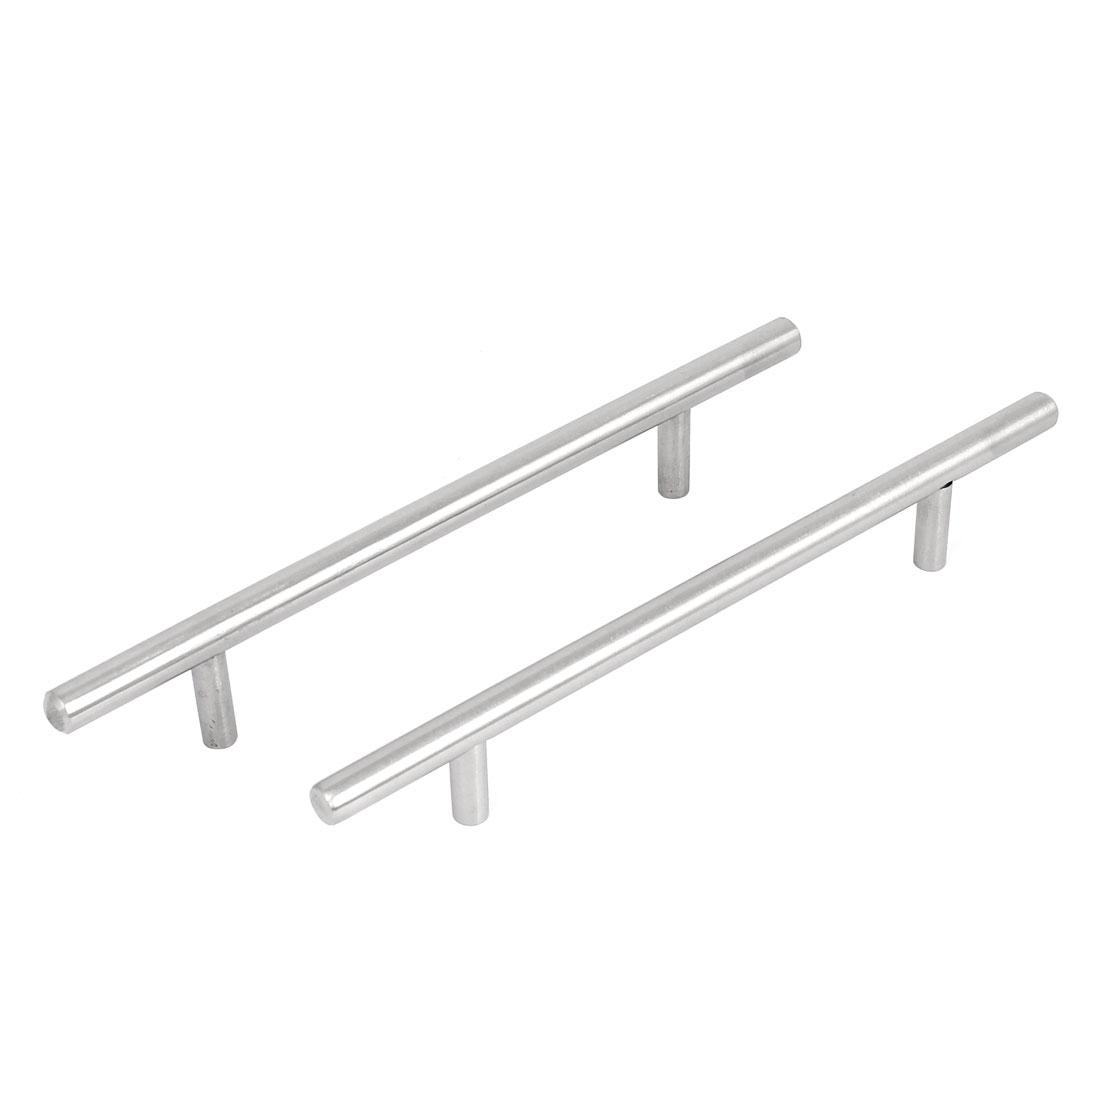 2Pcs Iron Cabinet Drawer Cupboard Door Pull Handles Grip 195mm Length